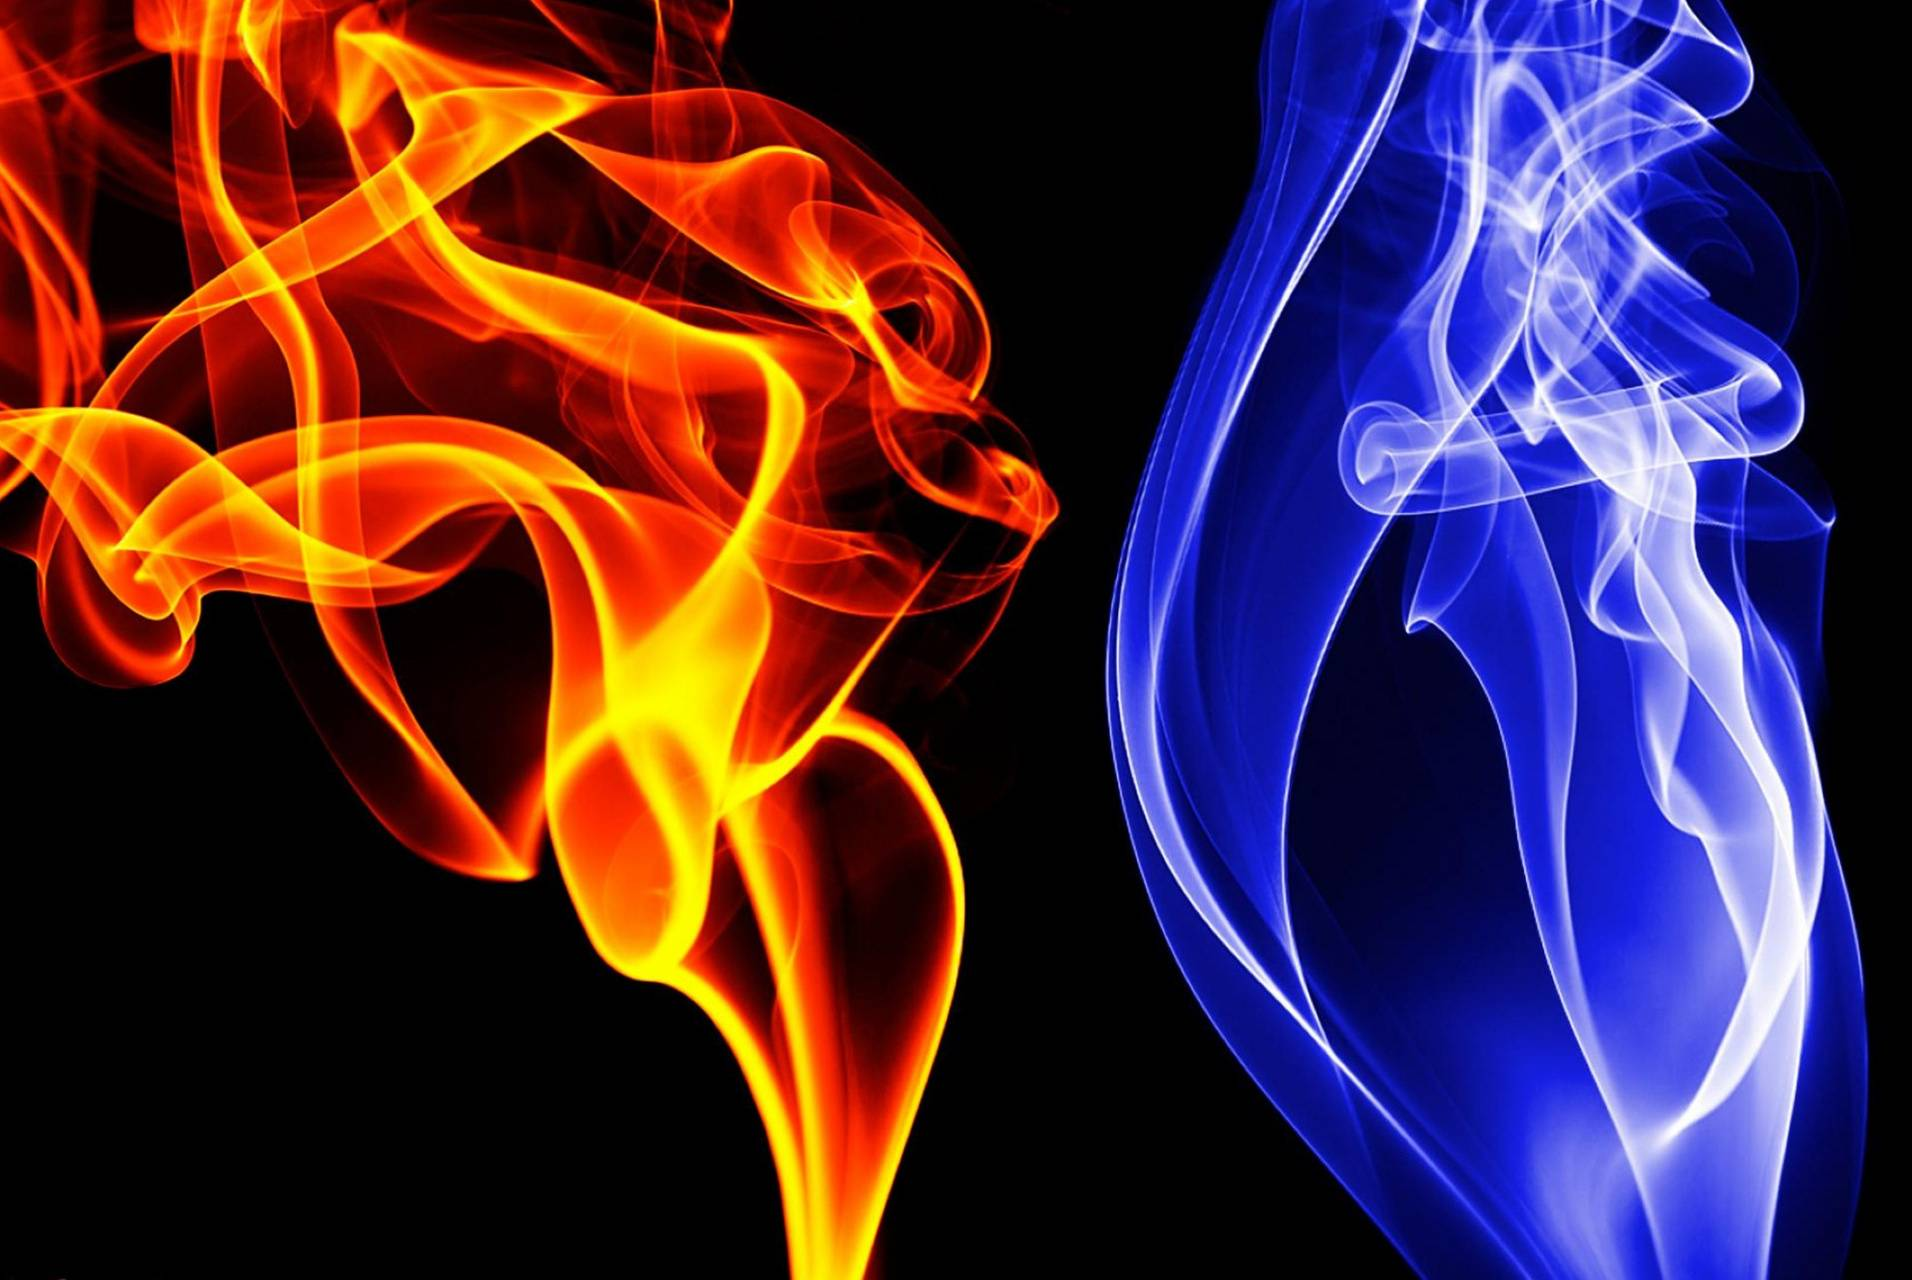 Fire Smoke Ice